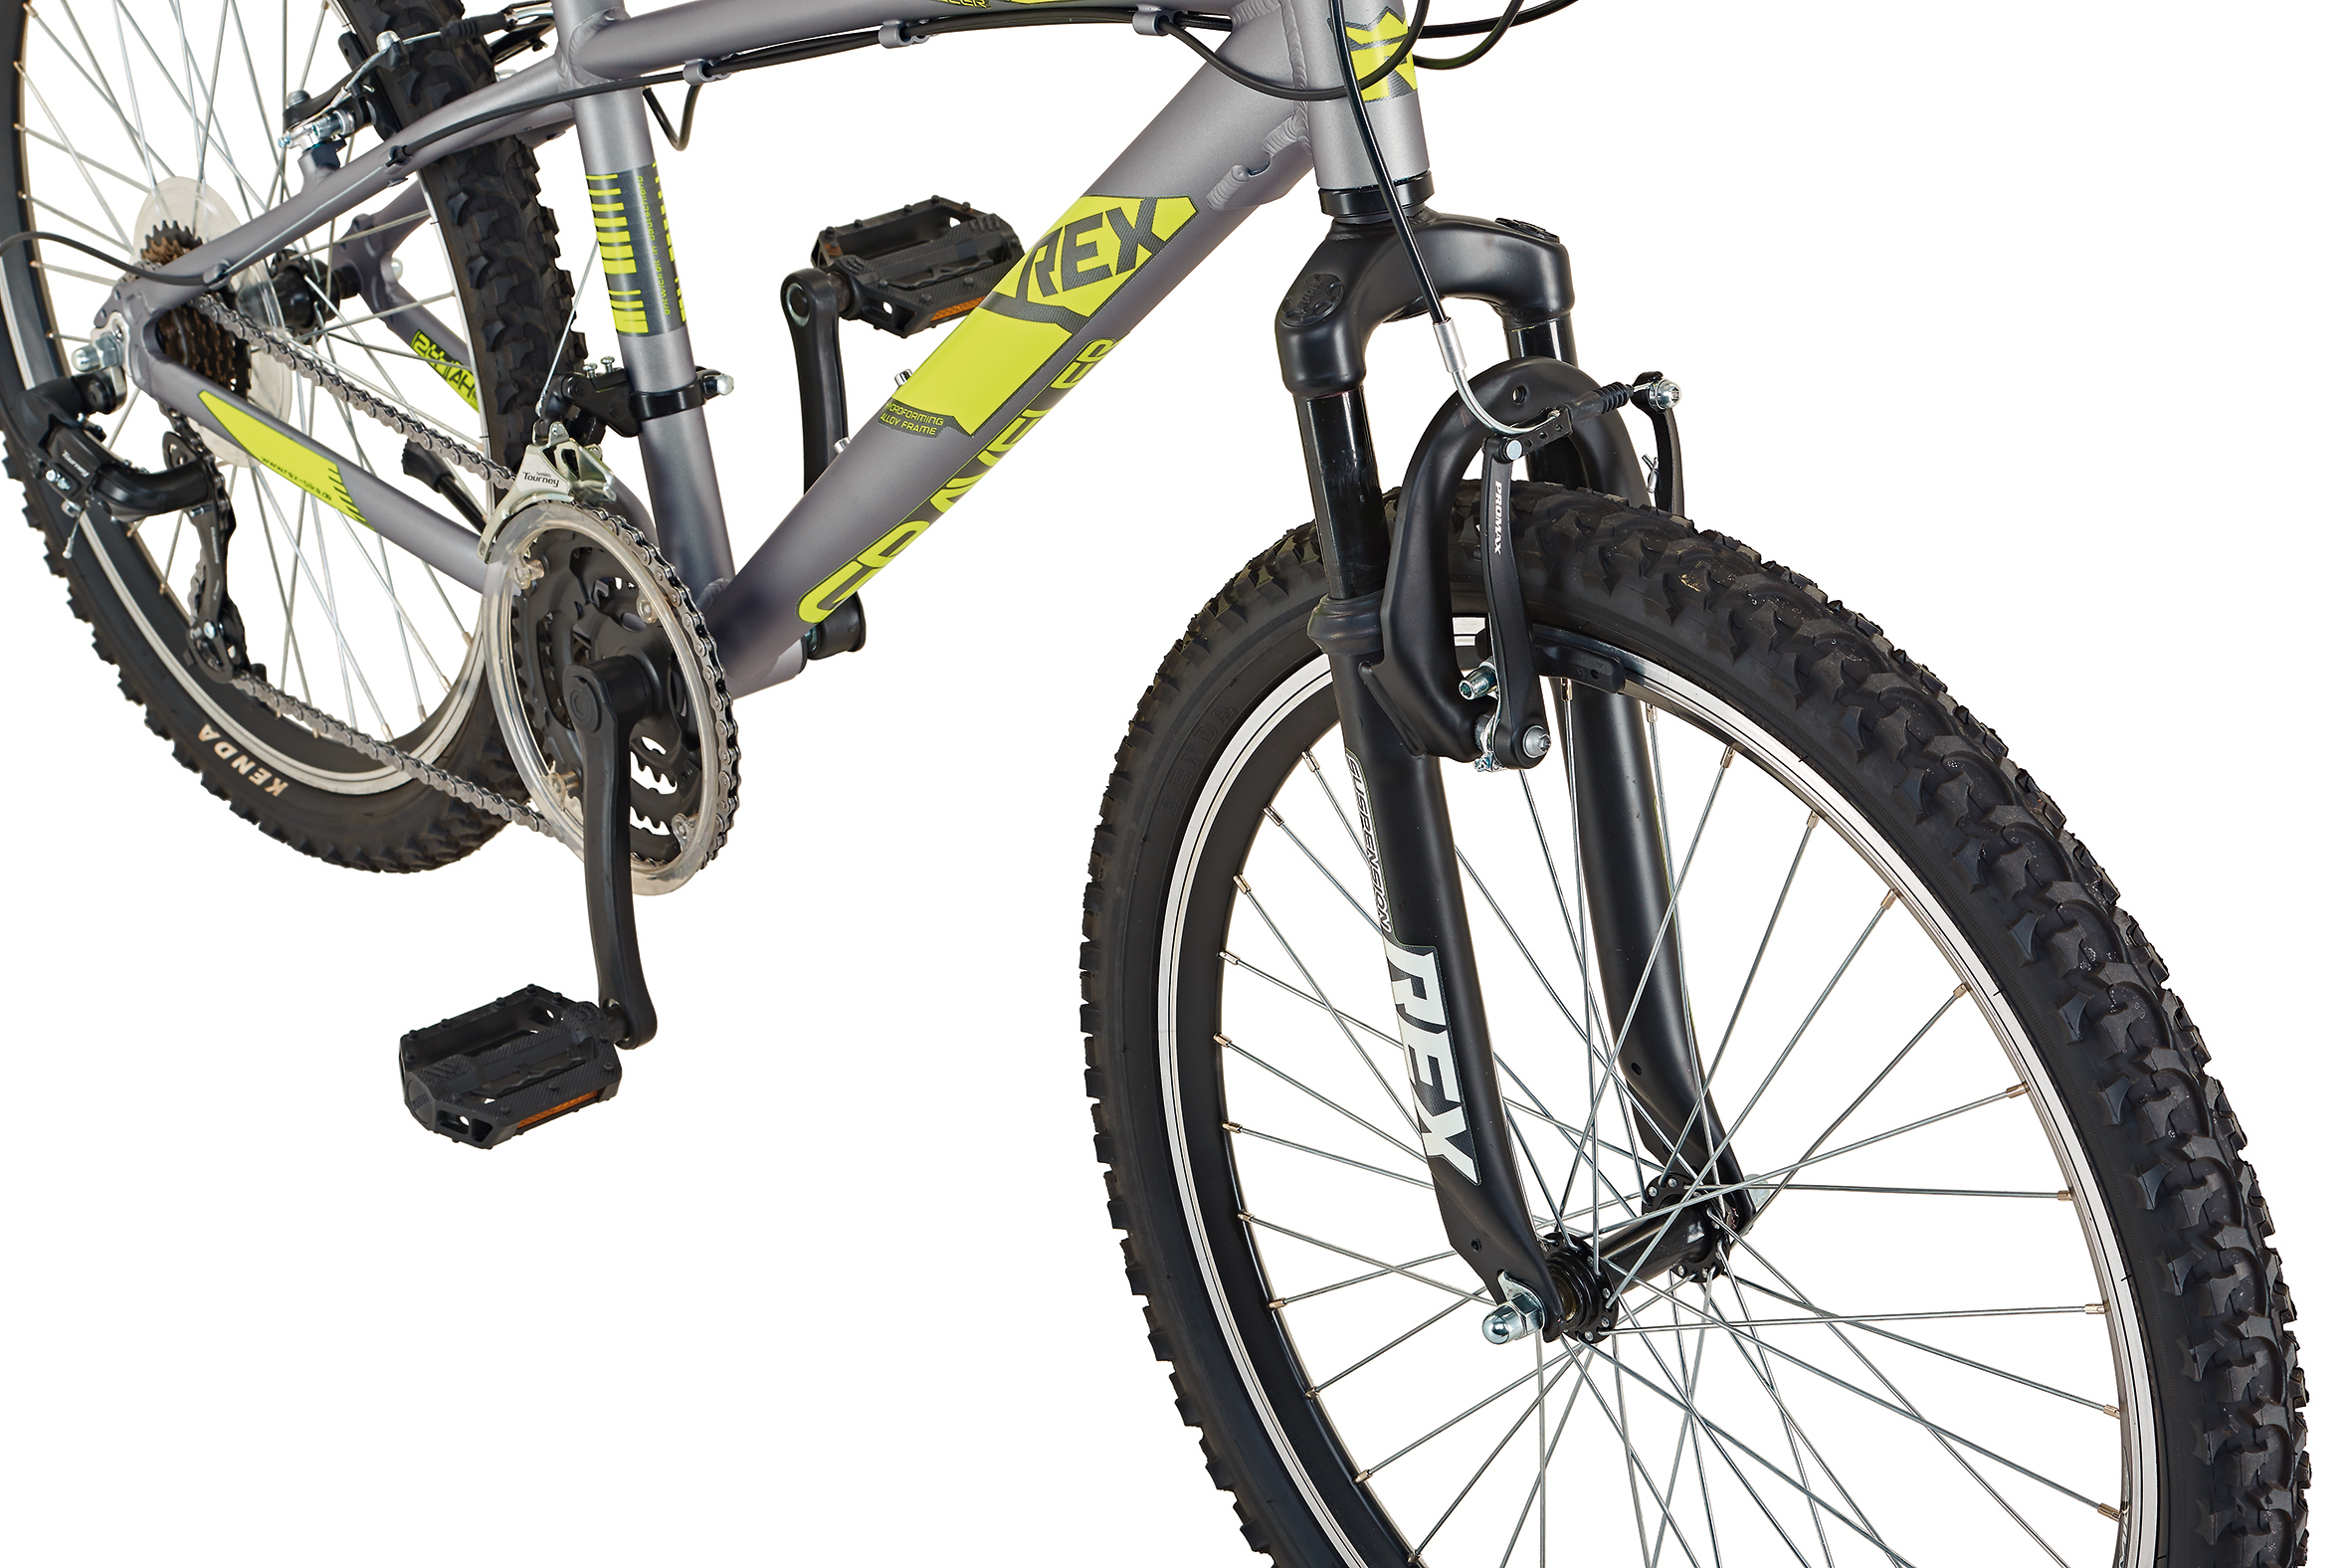 "Rex Bike Jugendfahrrad / Graveler Twentyfour Kids Bike 24"" Bild 5"